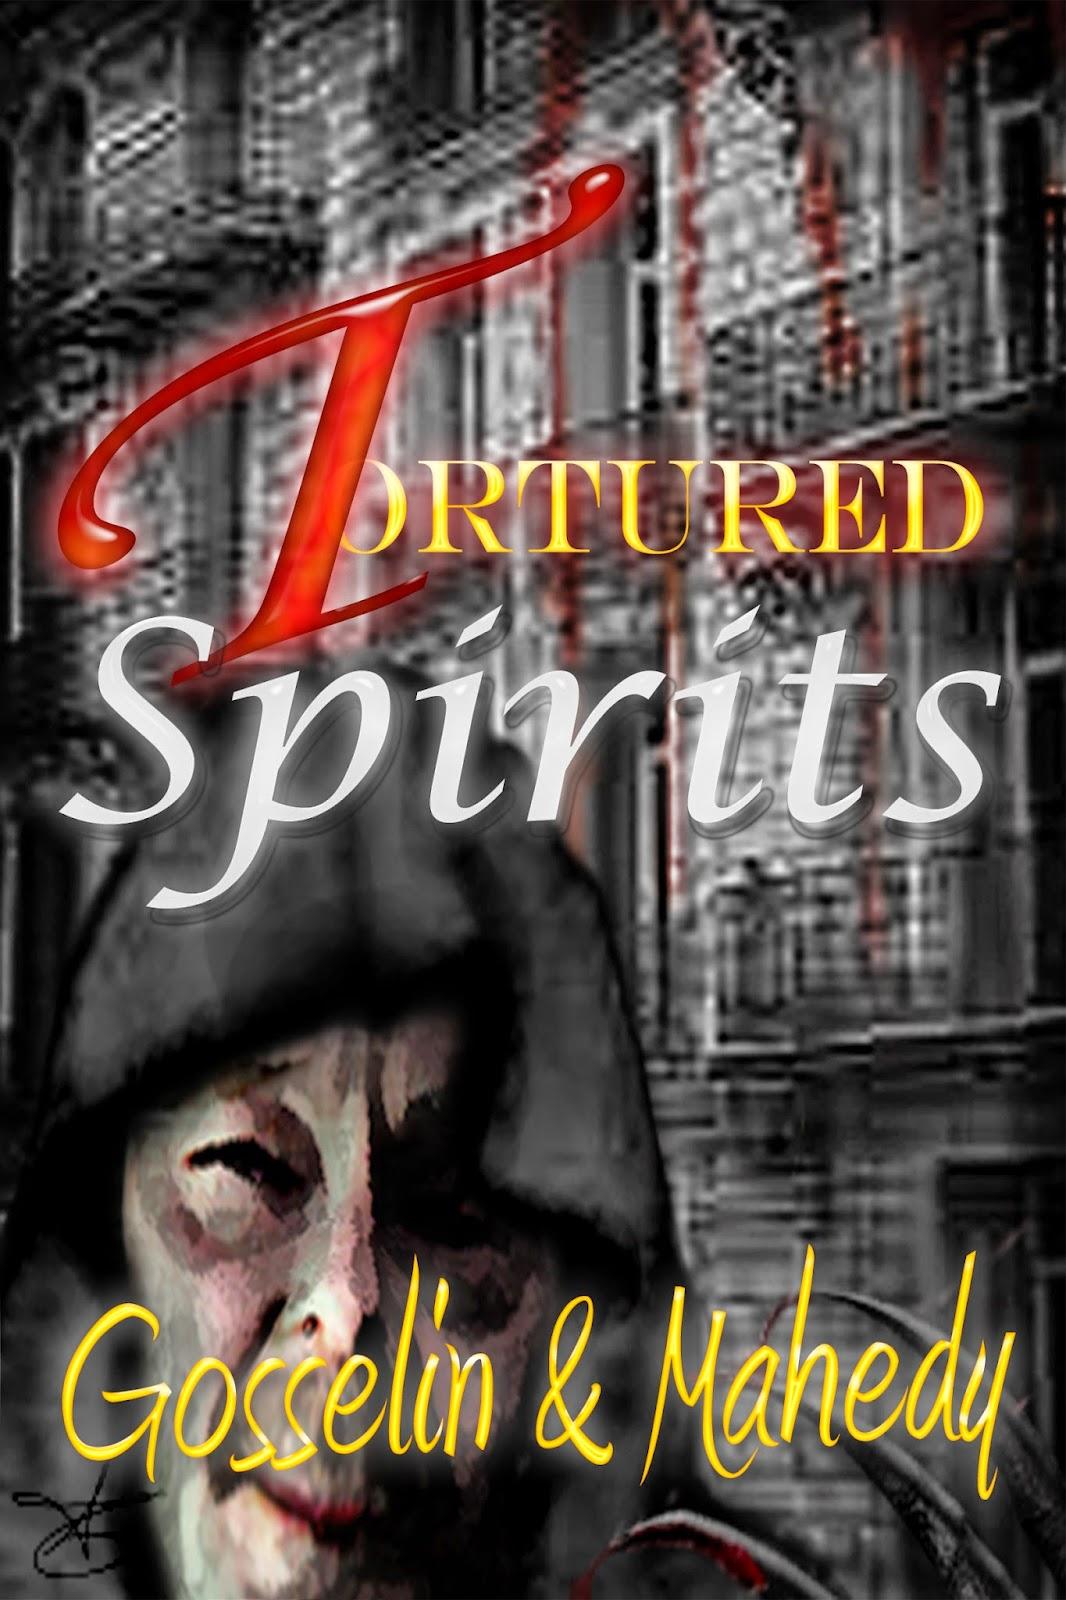 http://2espritsspirits.blogspot.ca/p/blog-page_8.html